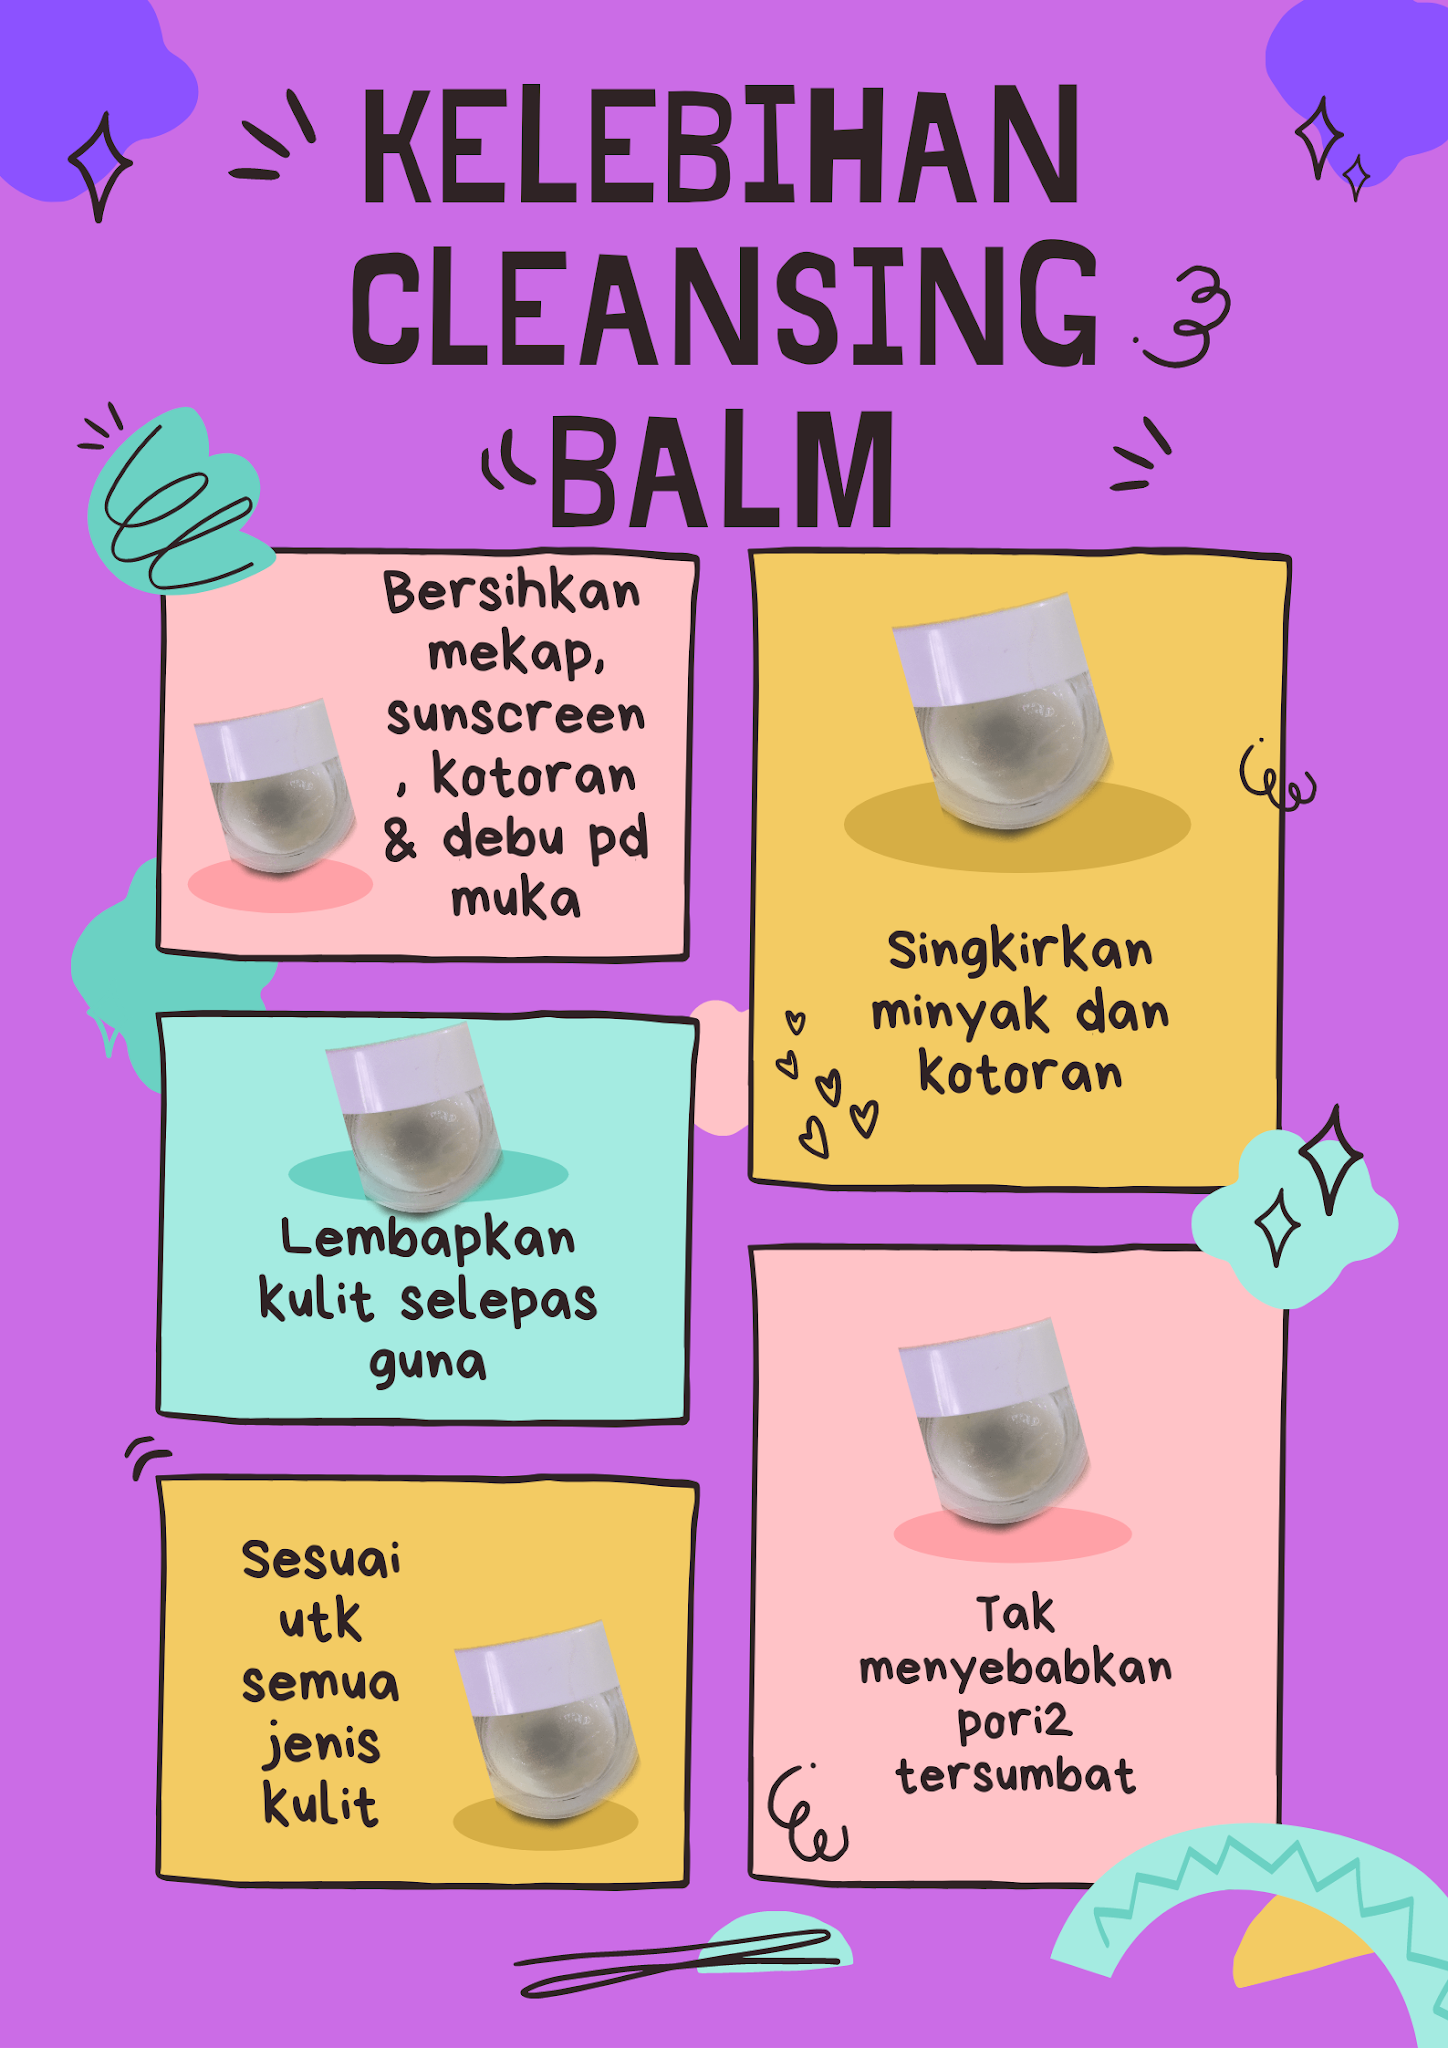 cleansing balm, cleansing balm obsess, cuci mekap